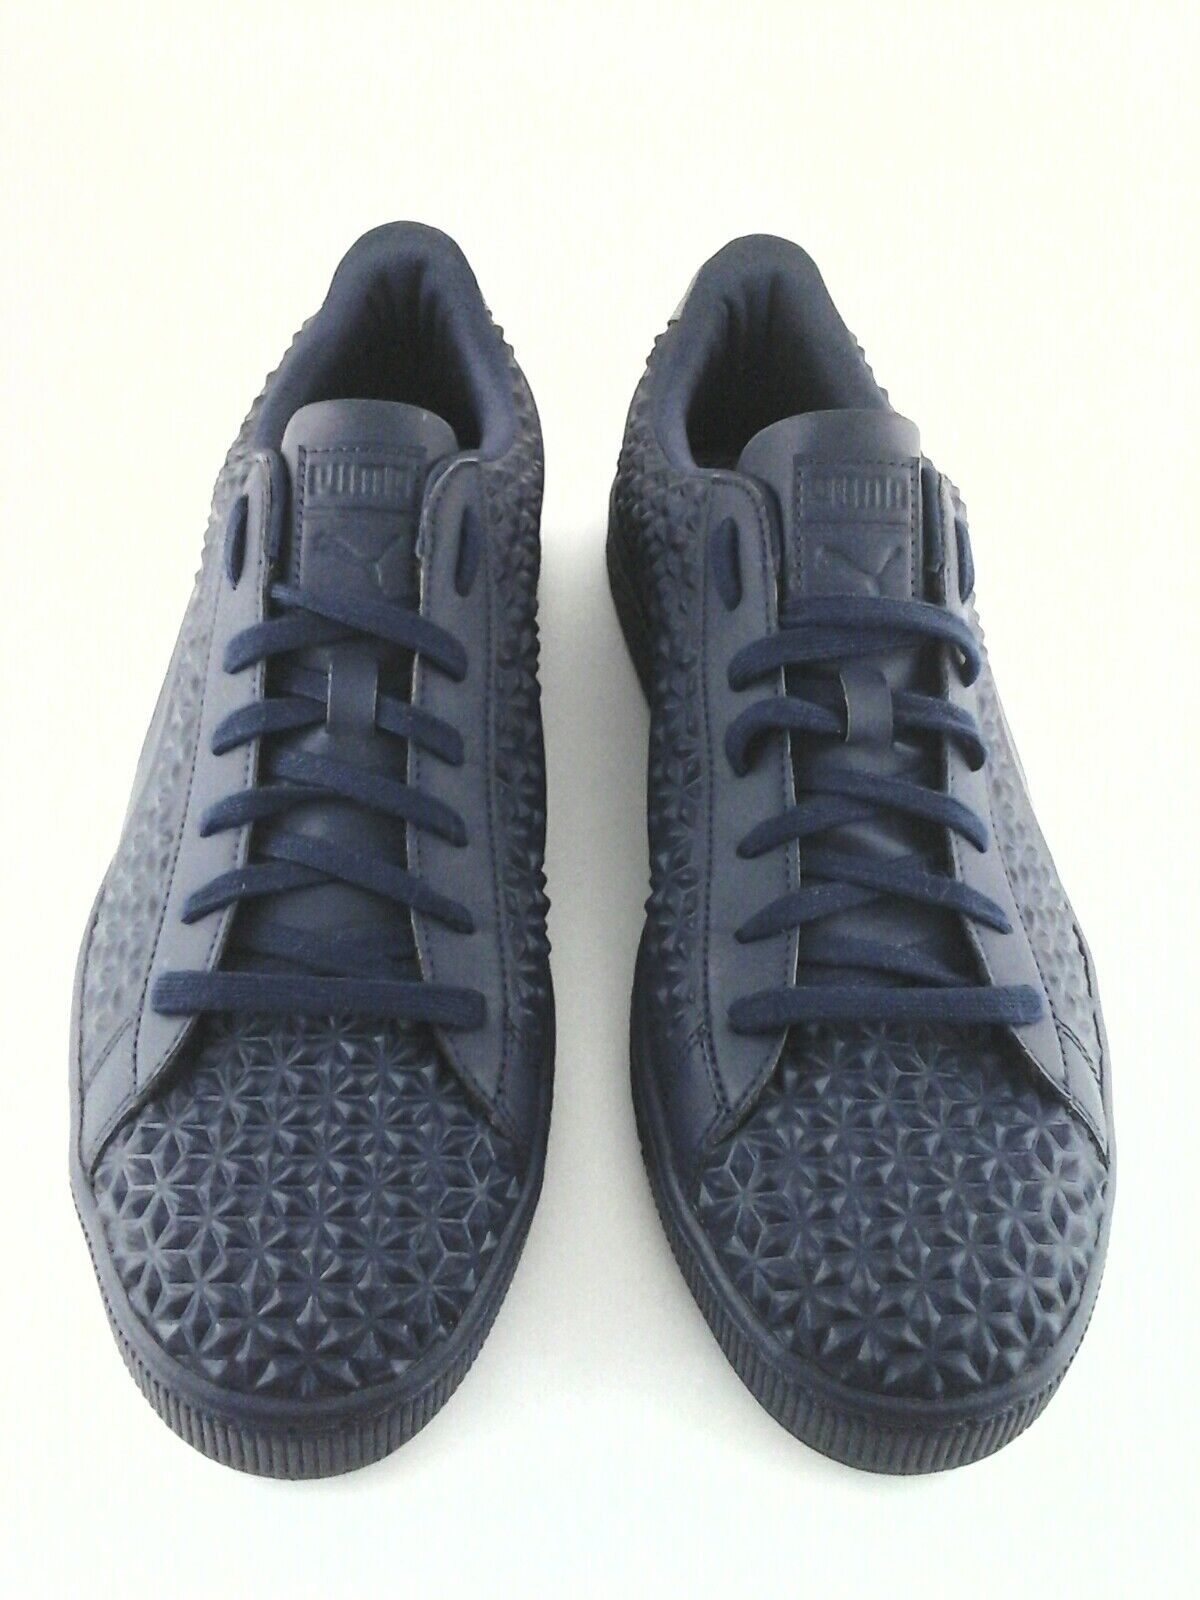 PUMA BASKET Sneakers Diamond STUD EMBOSSED Blue Casual Shoes US 13 EU 47 $110 Scarpe classiche da uomo